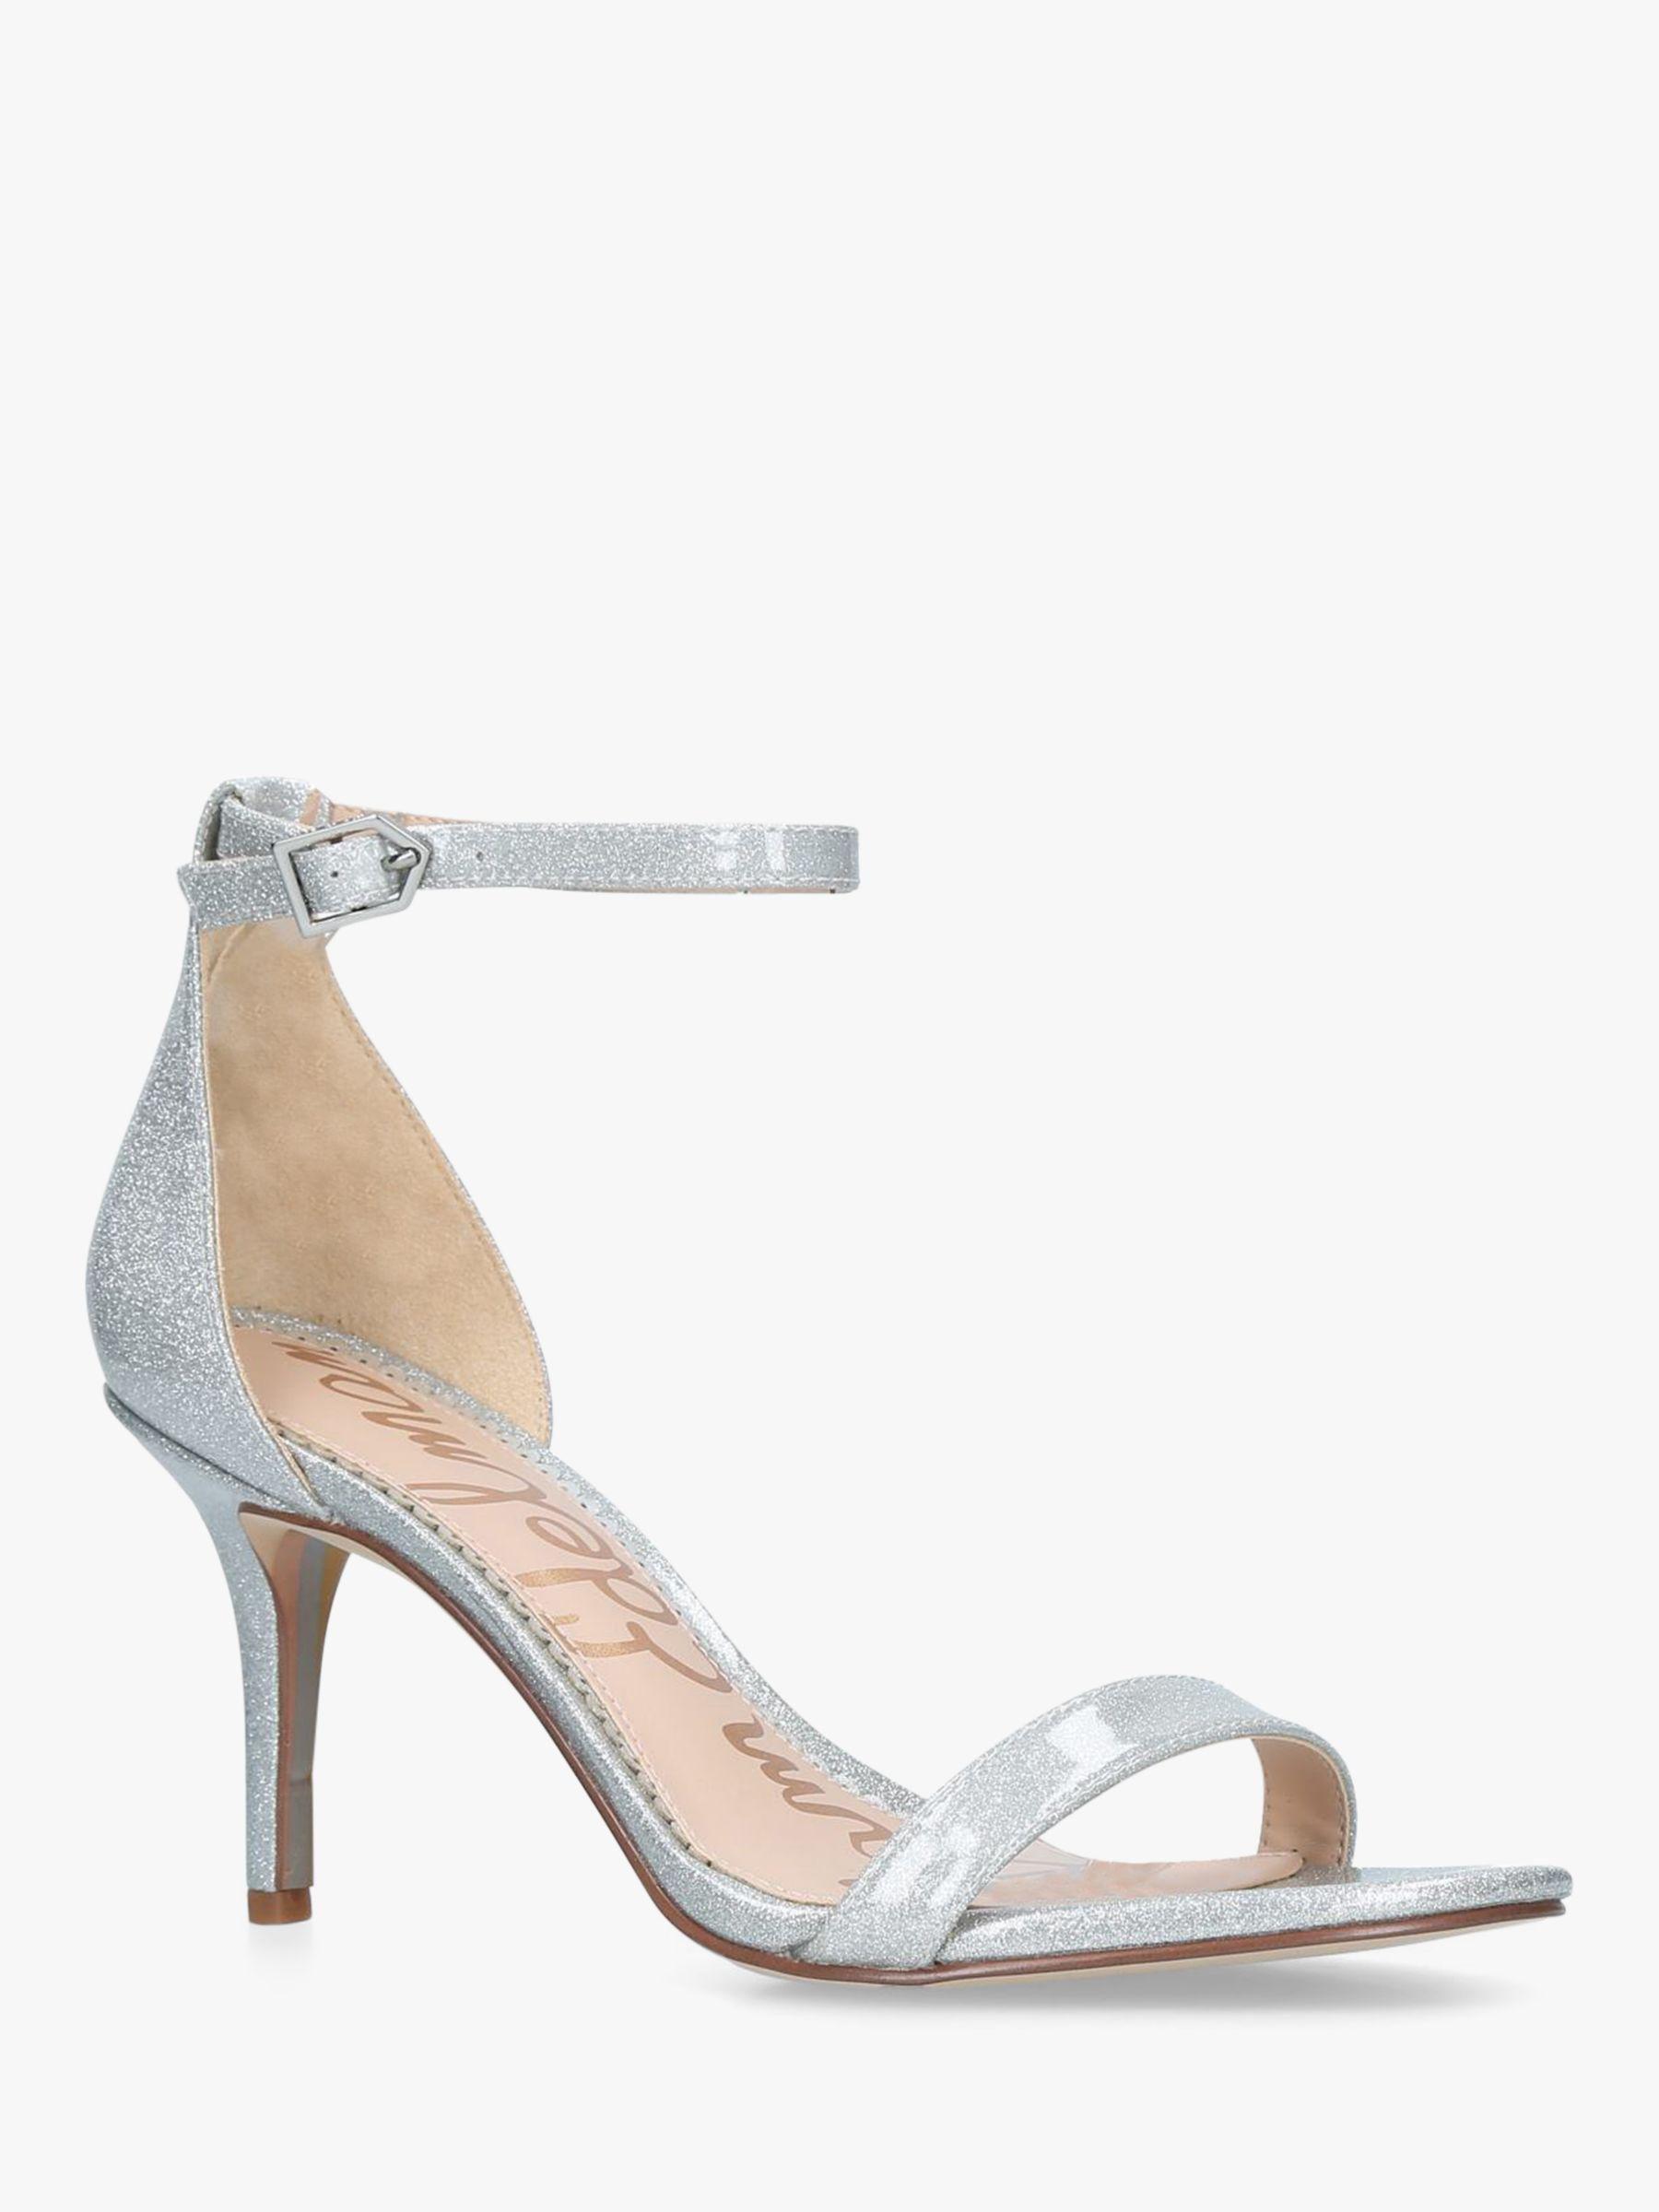 f3edcad98b7c Sam Edelman Patti Ankle Strap Heeled Sandals in Metallic - Lyst